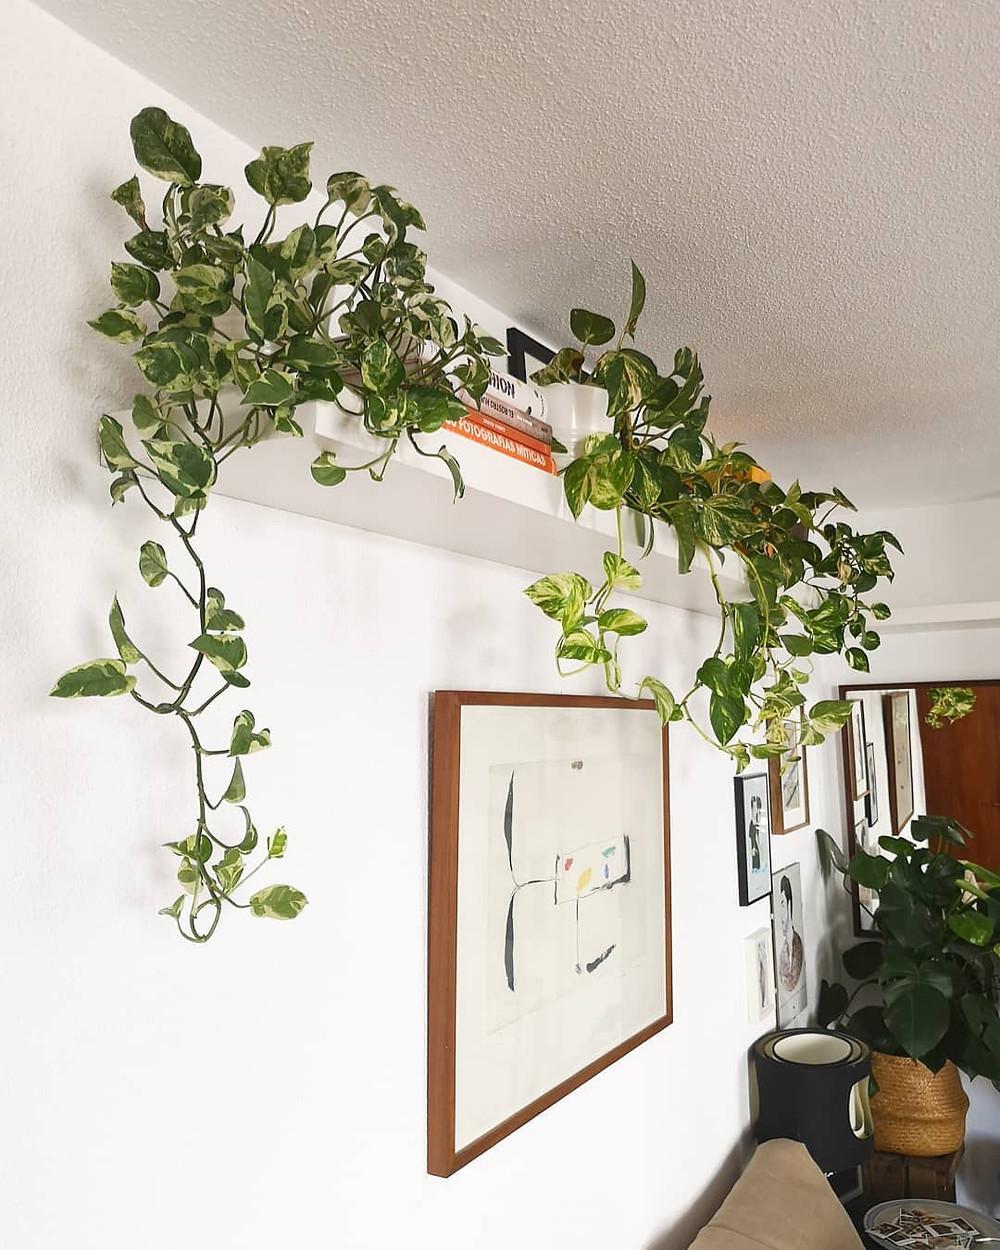 Pothos Low-Light Houseplants Perfect For Dark Rooms